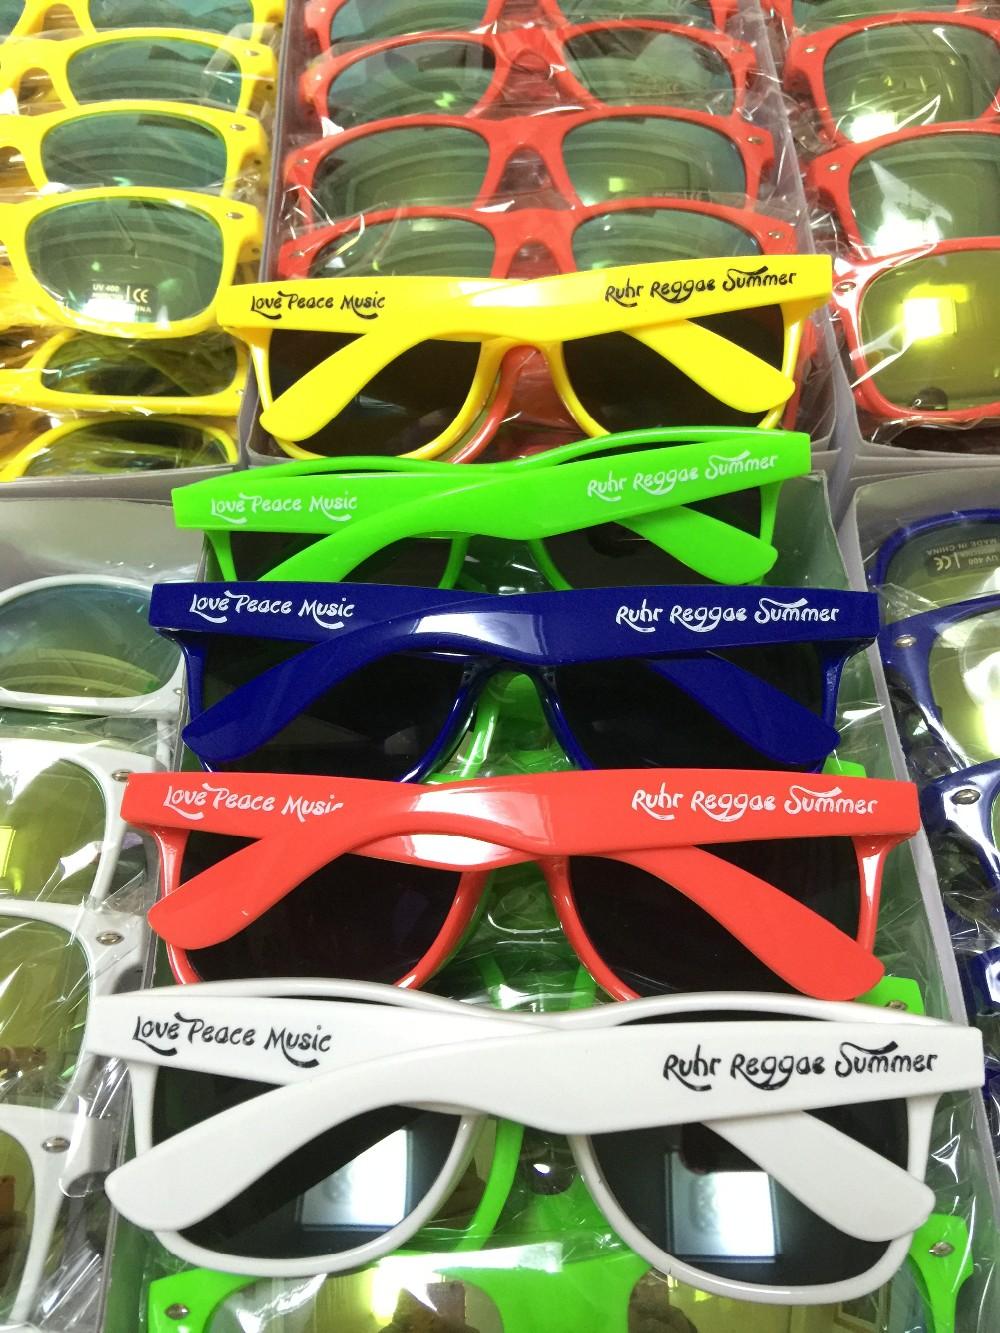 Design Your Own Sunglasses With Logo | Louisiana Bucket Brigade